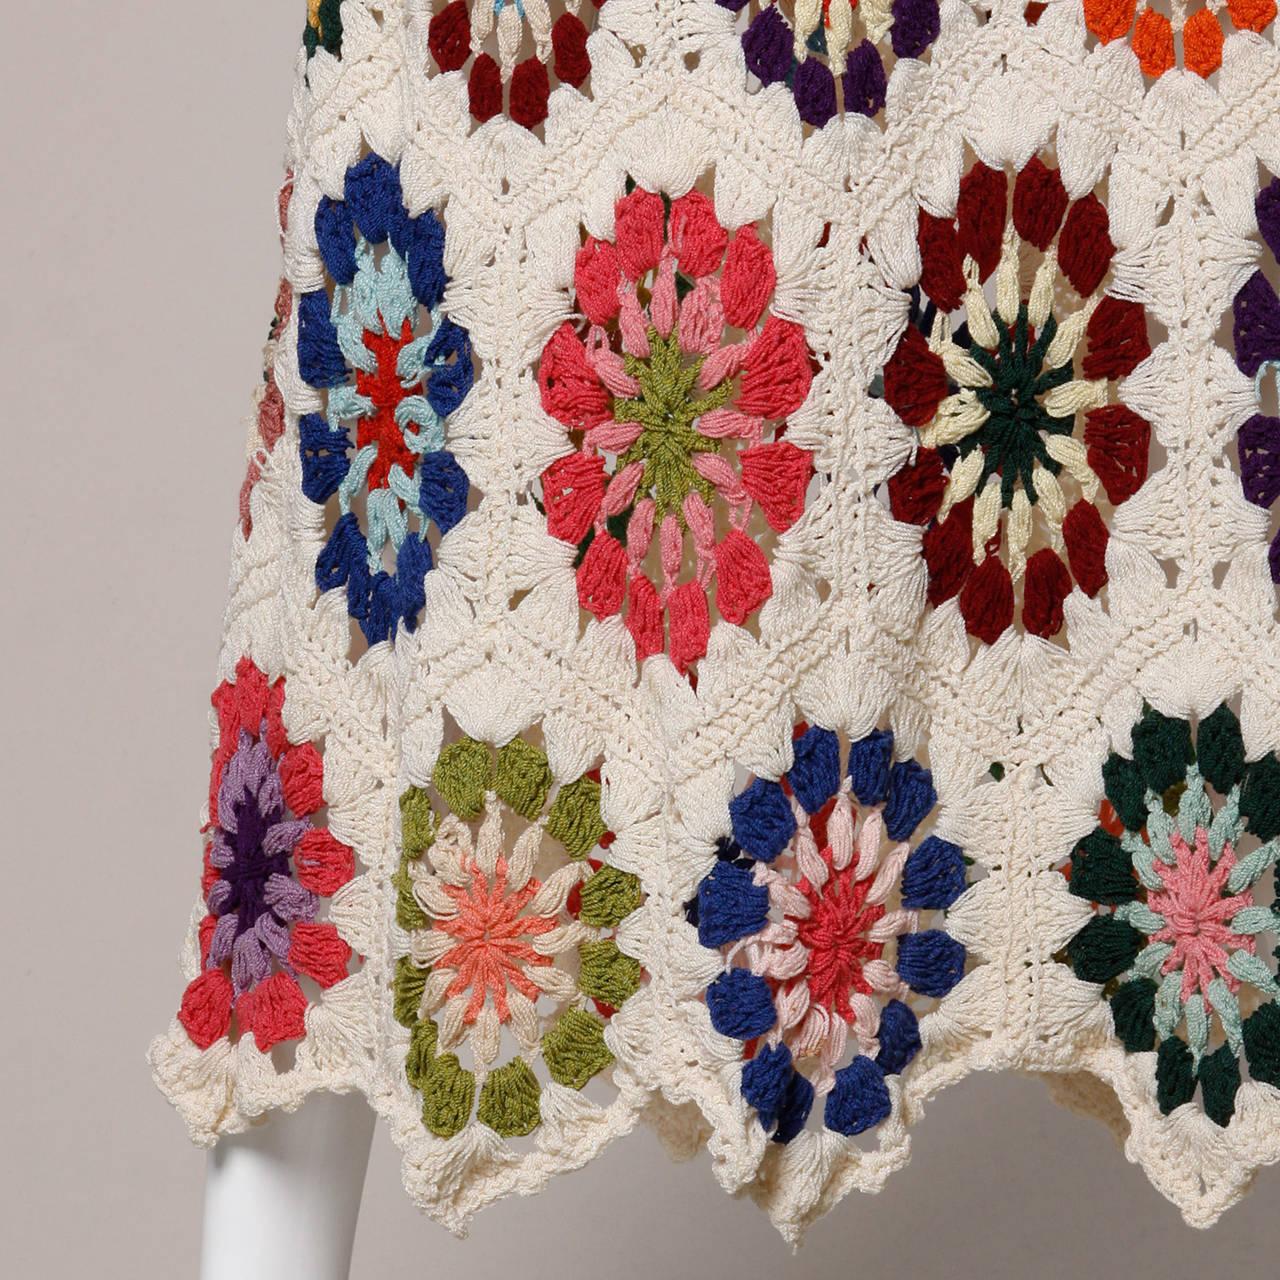 1970s Vintage Colorful Hand-Crochet Boho Maxi Skirt 5